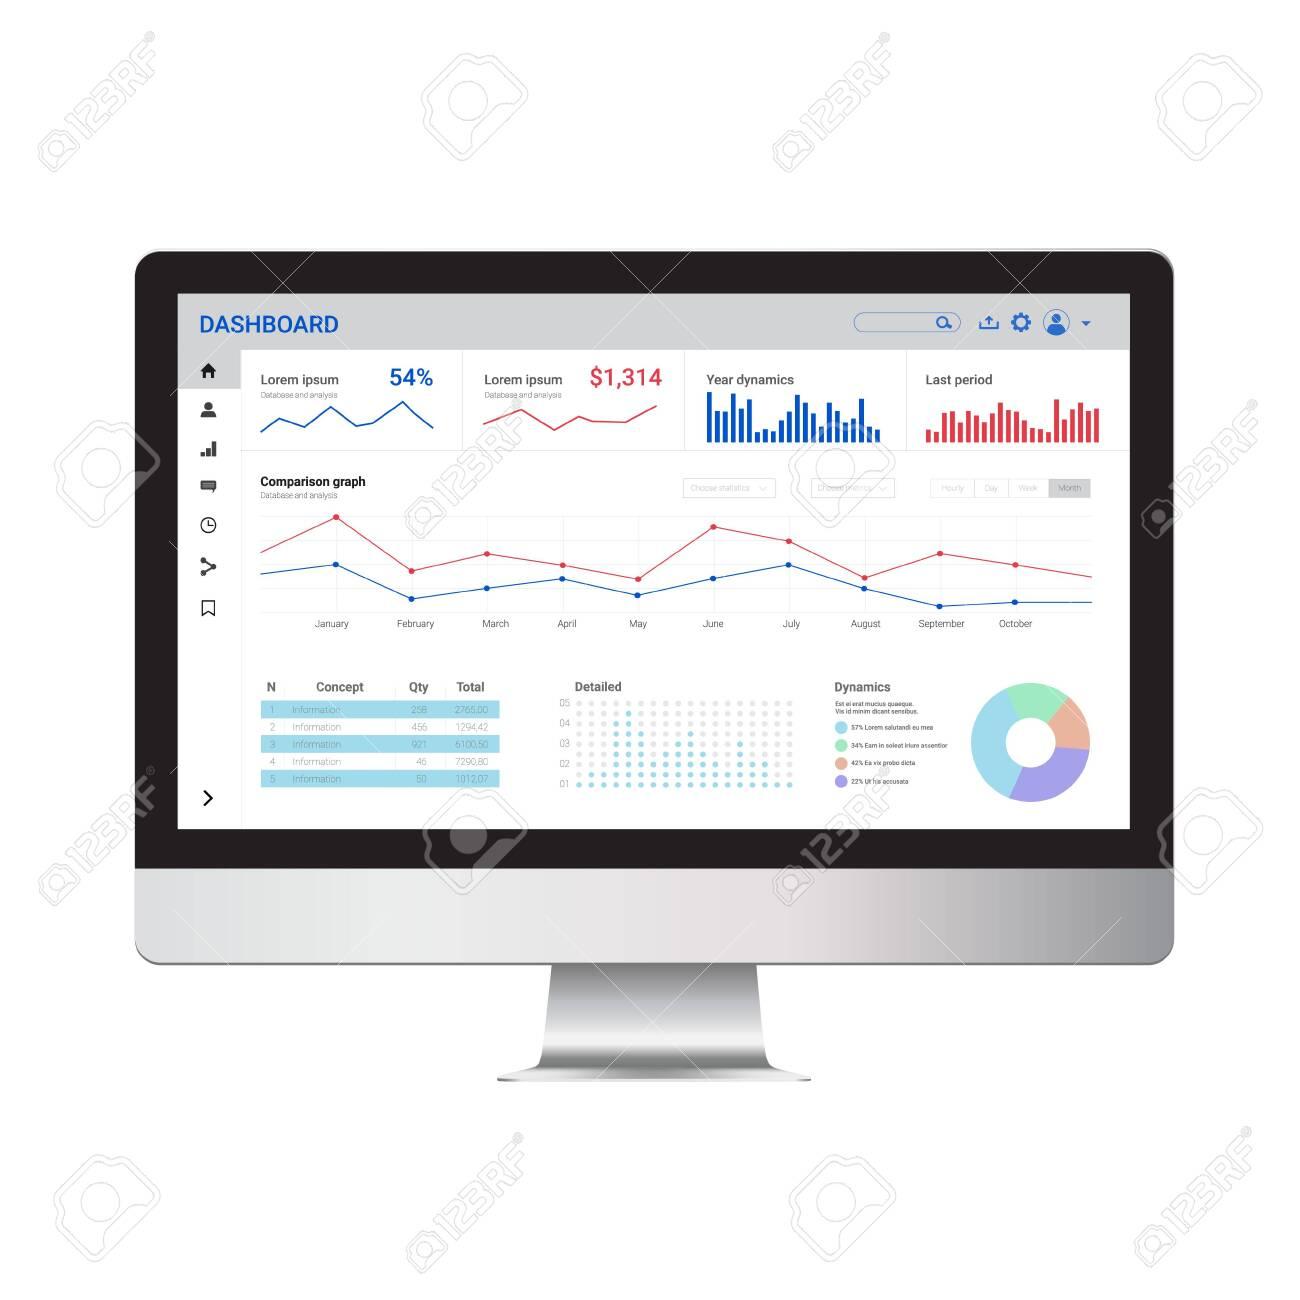 Online statistics and data Analytics. Digital marketing and trading templat enad mock up. - 145438330